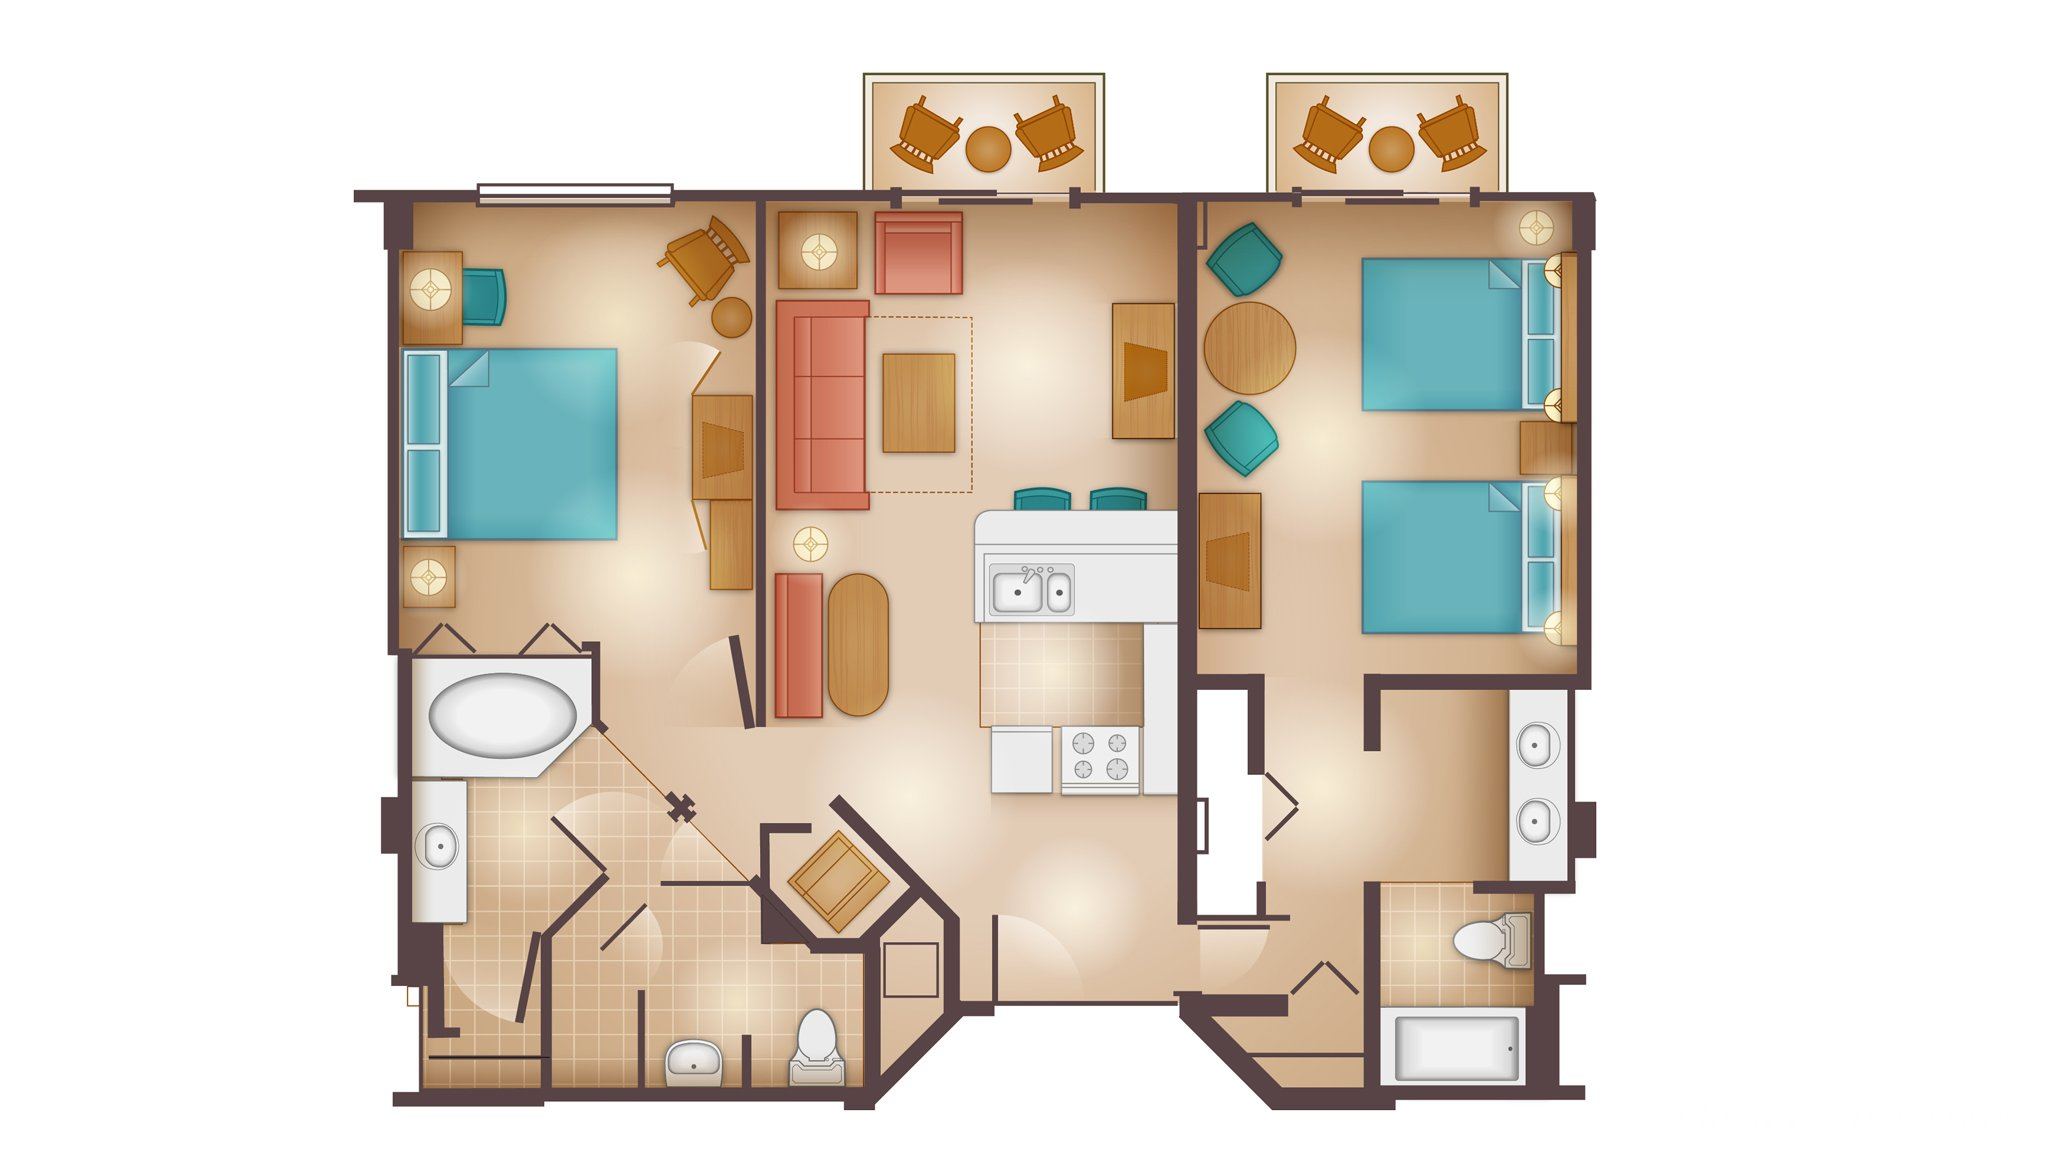 Beach Club - Dedicated Two-Bedroom Villa Floor Plan